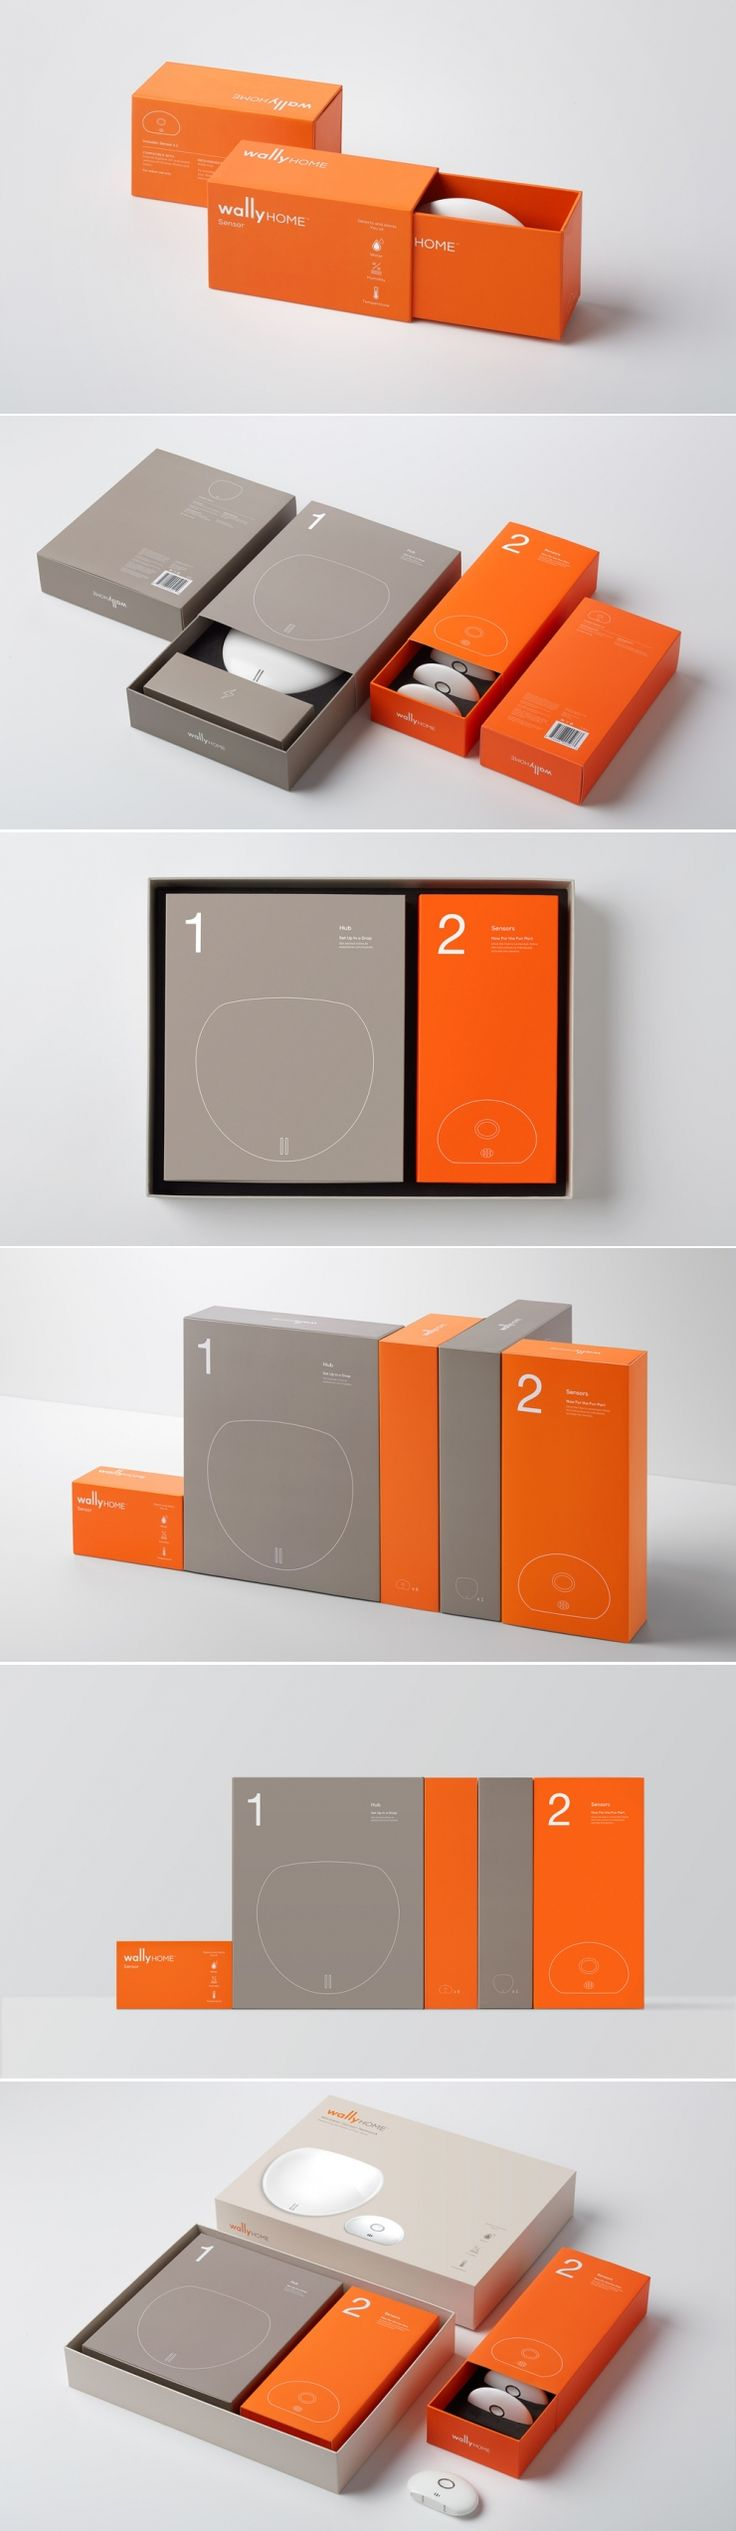 Wally - Home Sensor System — The Dieline - Branding & Packaging Design - created via https://pinthemall.net